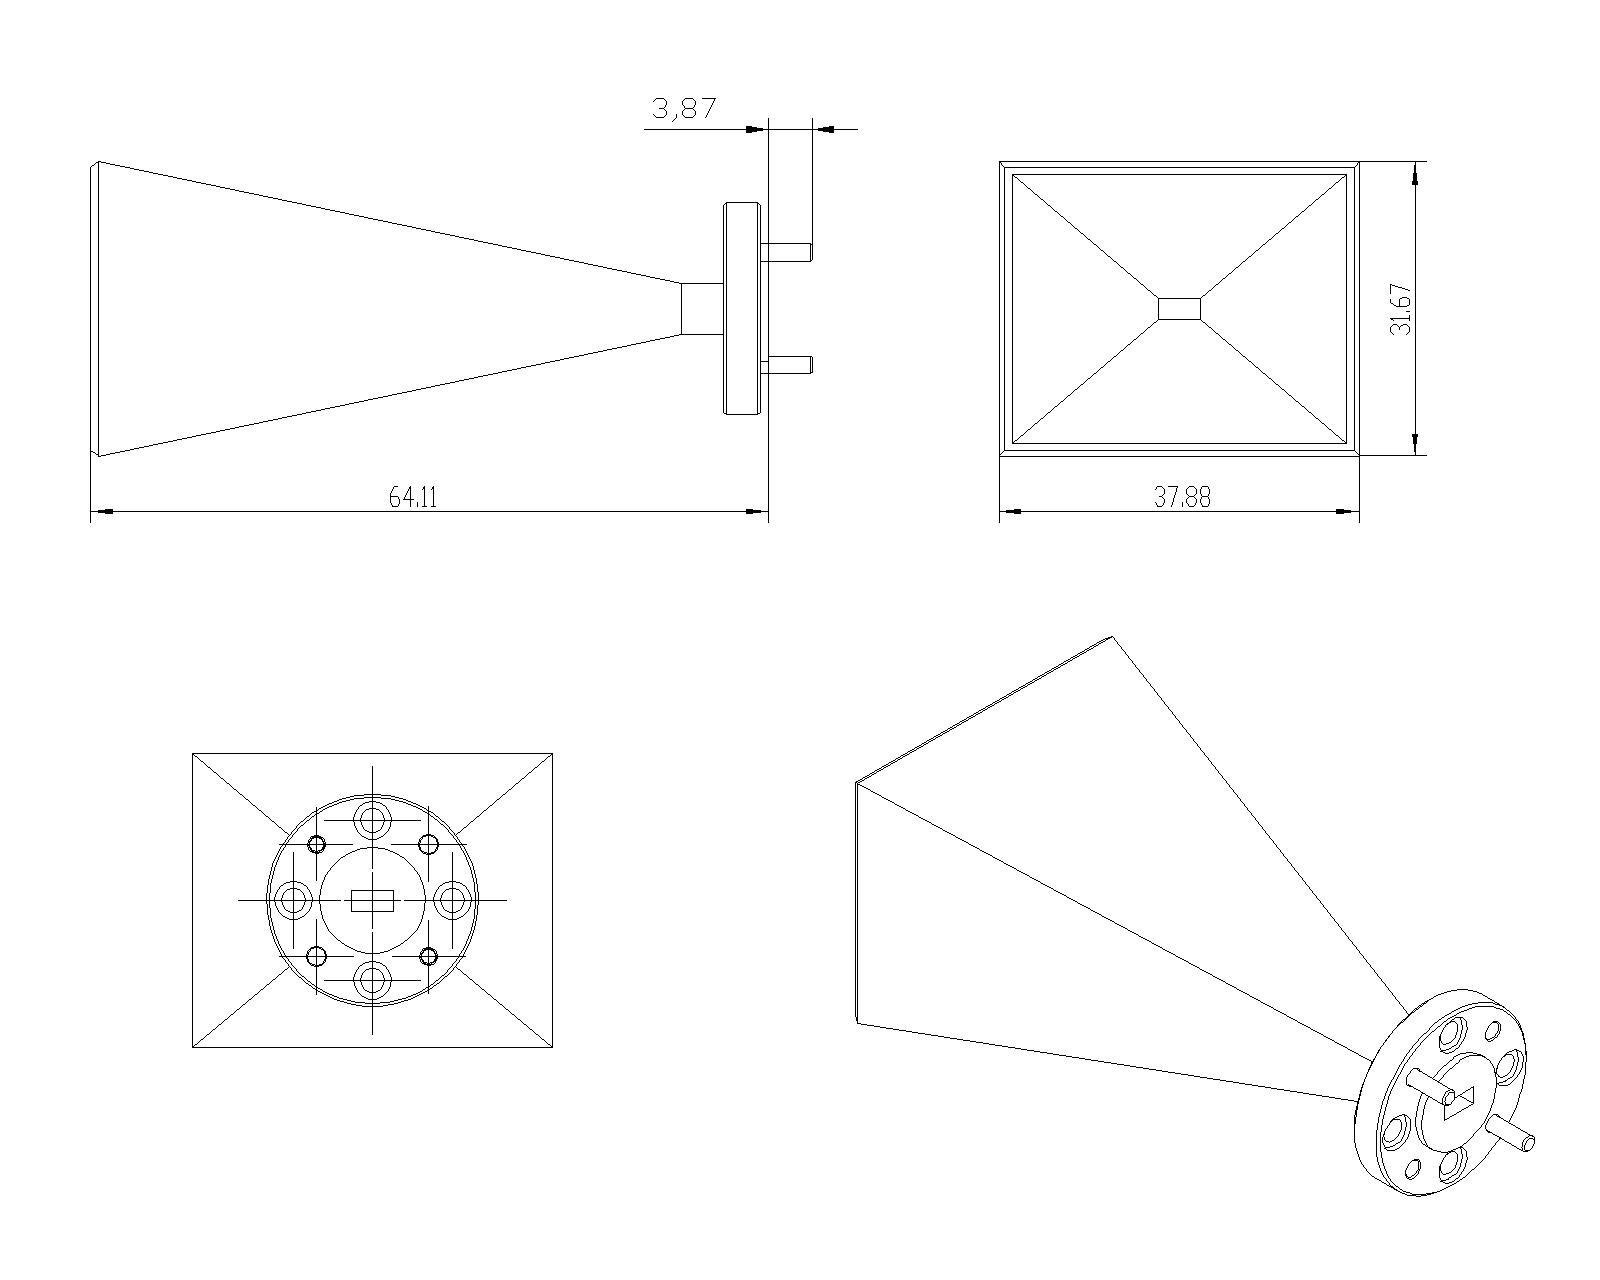 23 dBi Gain, 50 GHz to 75 GHz, WR-15 Waveguide Millimeter SGH Antenna